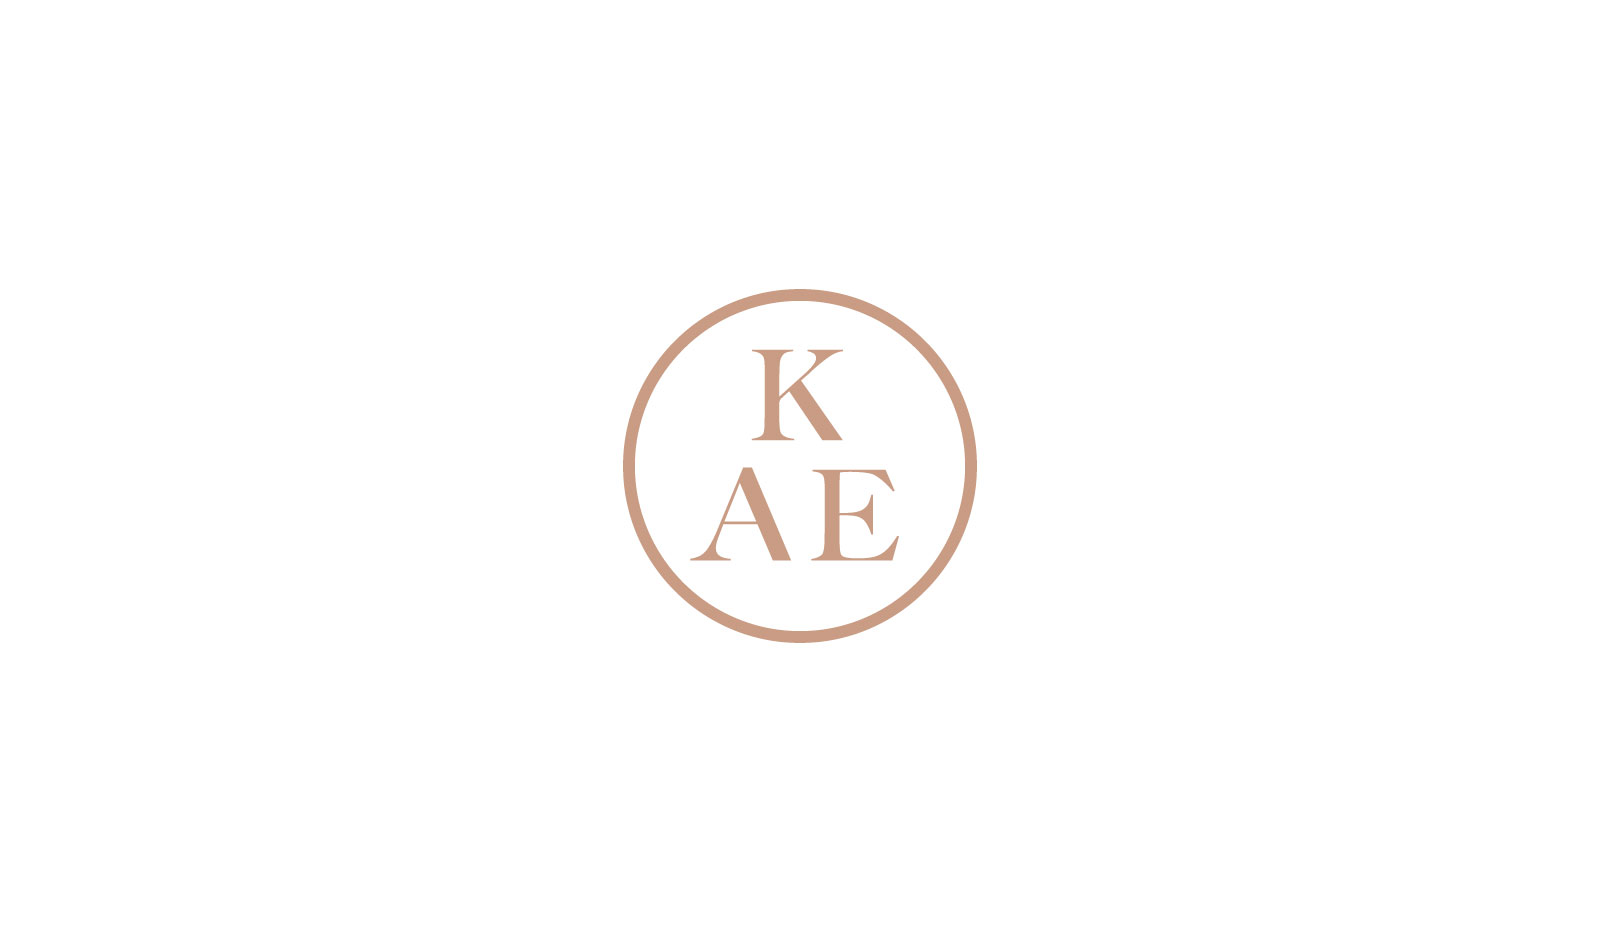 KAE Brand Identity